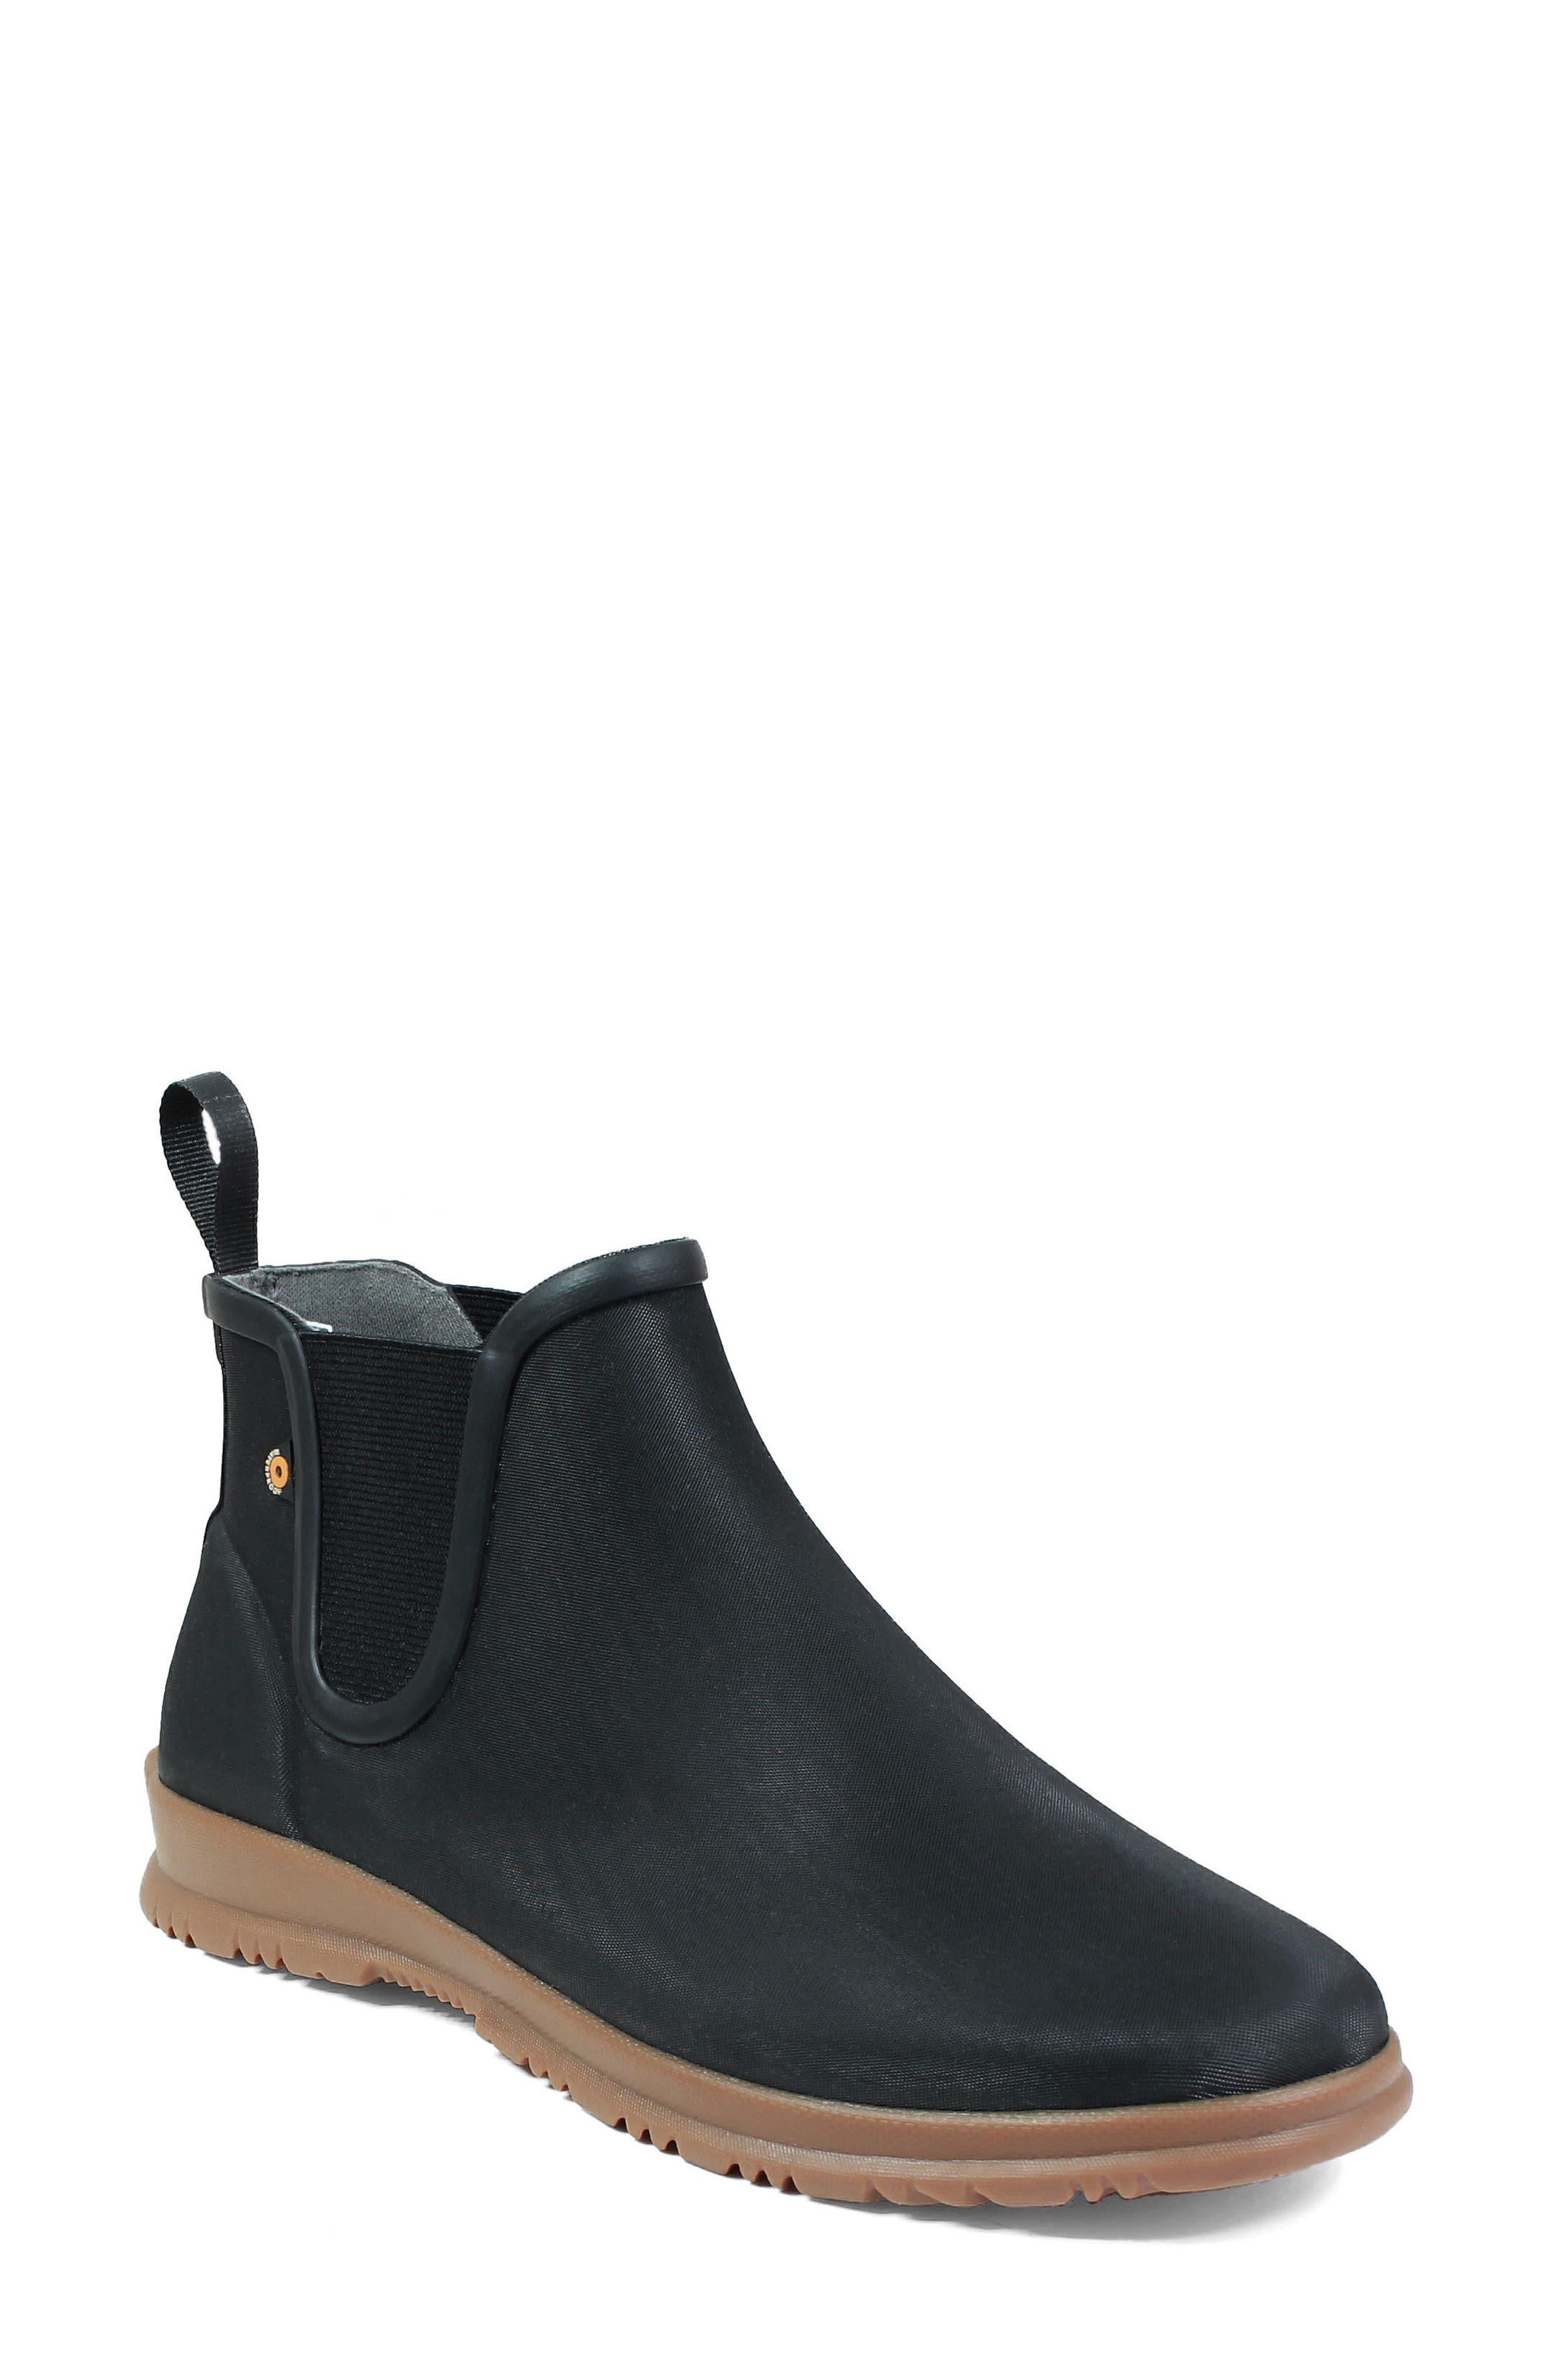 BOGS Sweetpea Rain Boot, Main, color, BLACK RUBBER